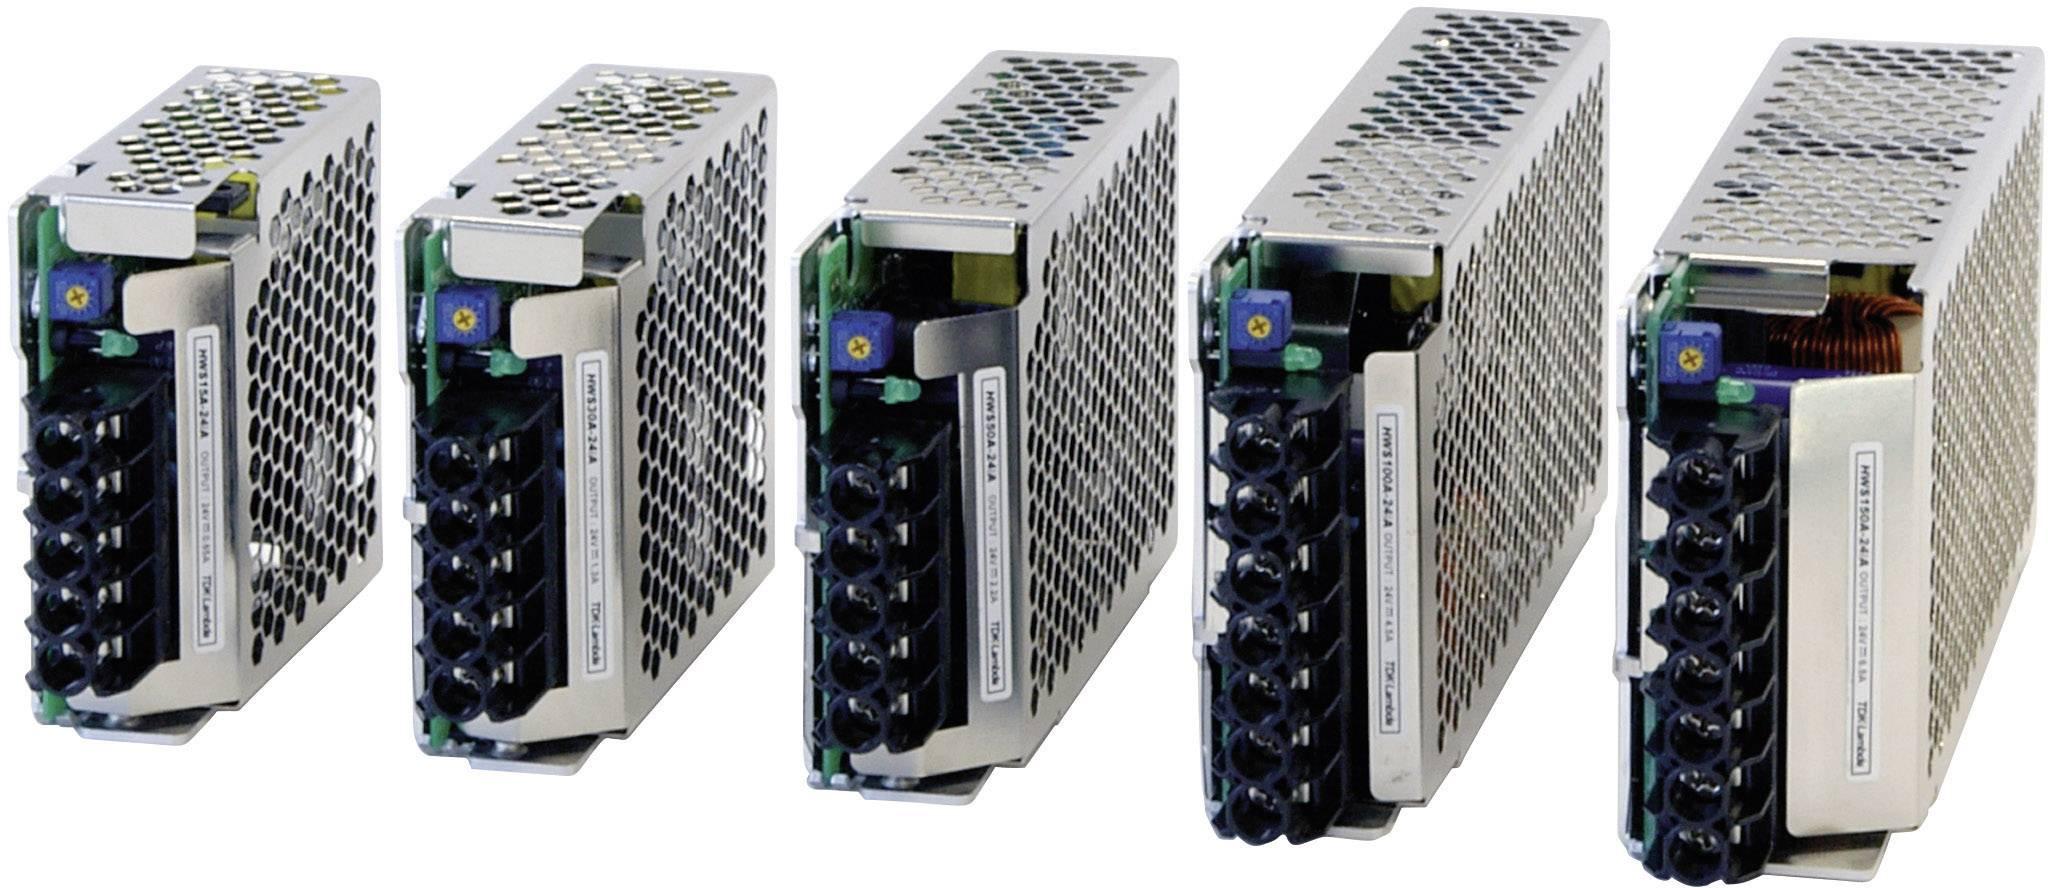 Zabudovateľný napájací zdroj TDK-Lambda HWS-100A-24, 24 V, 108 W